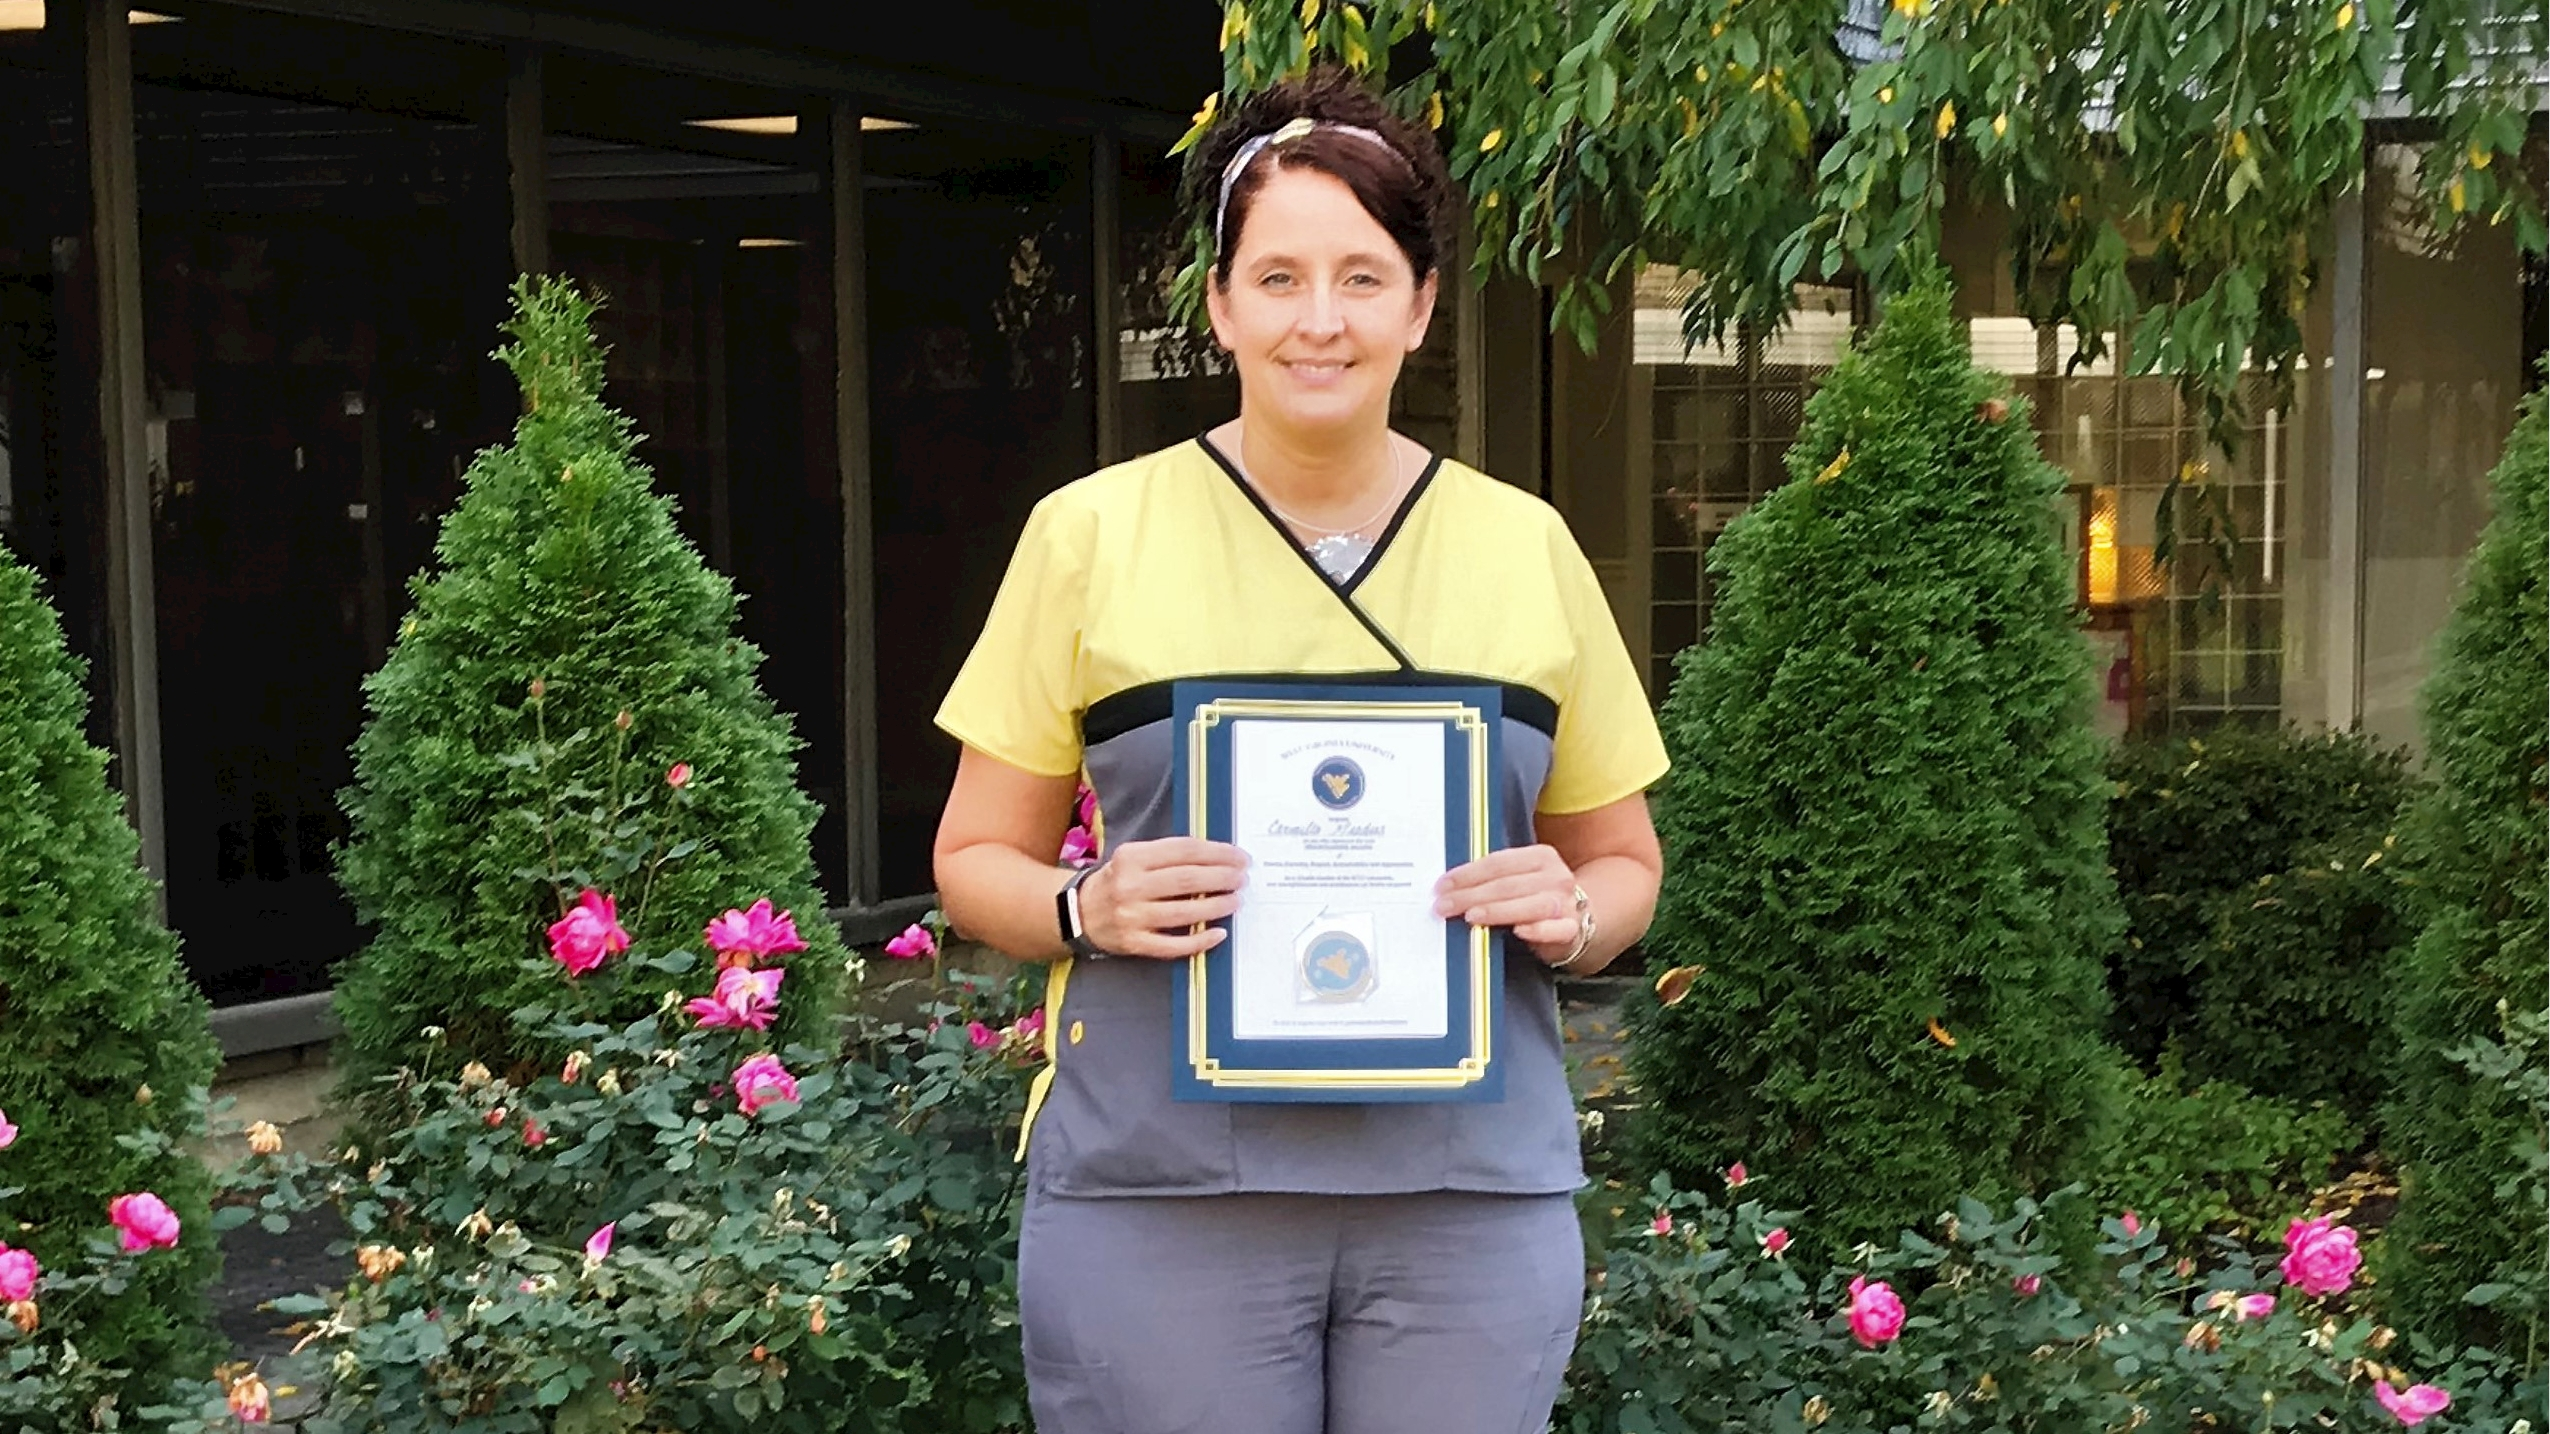 Carmella Meadows is a Mountaineer Value Coin recipient.